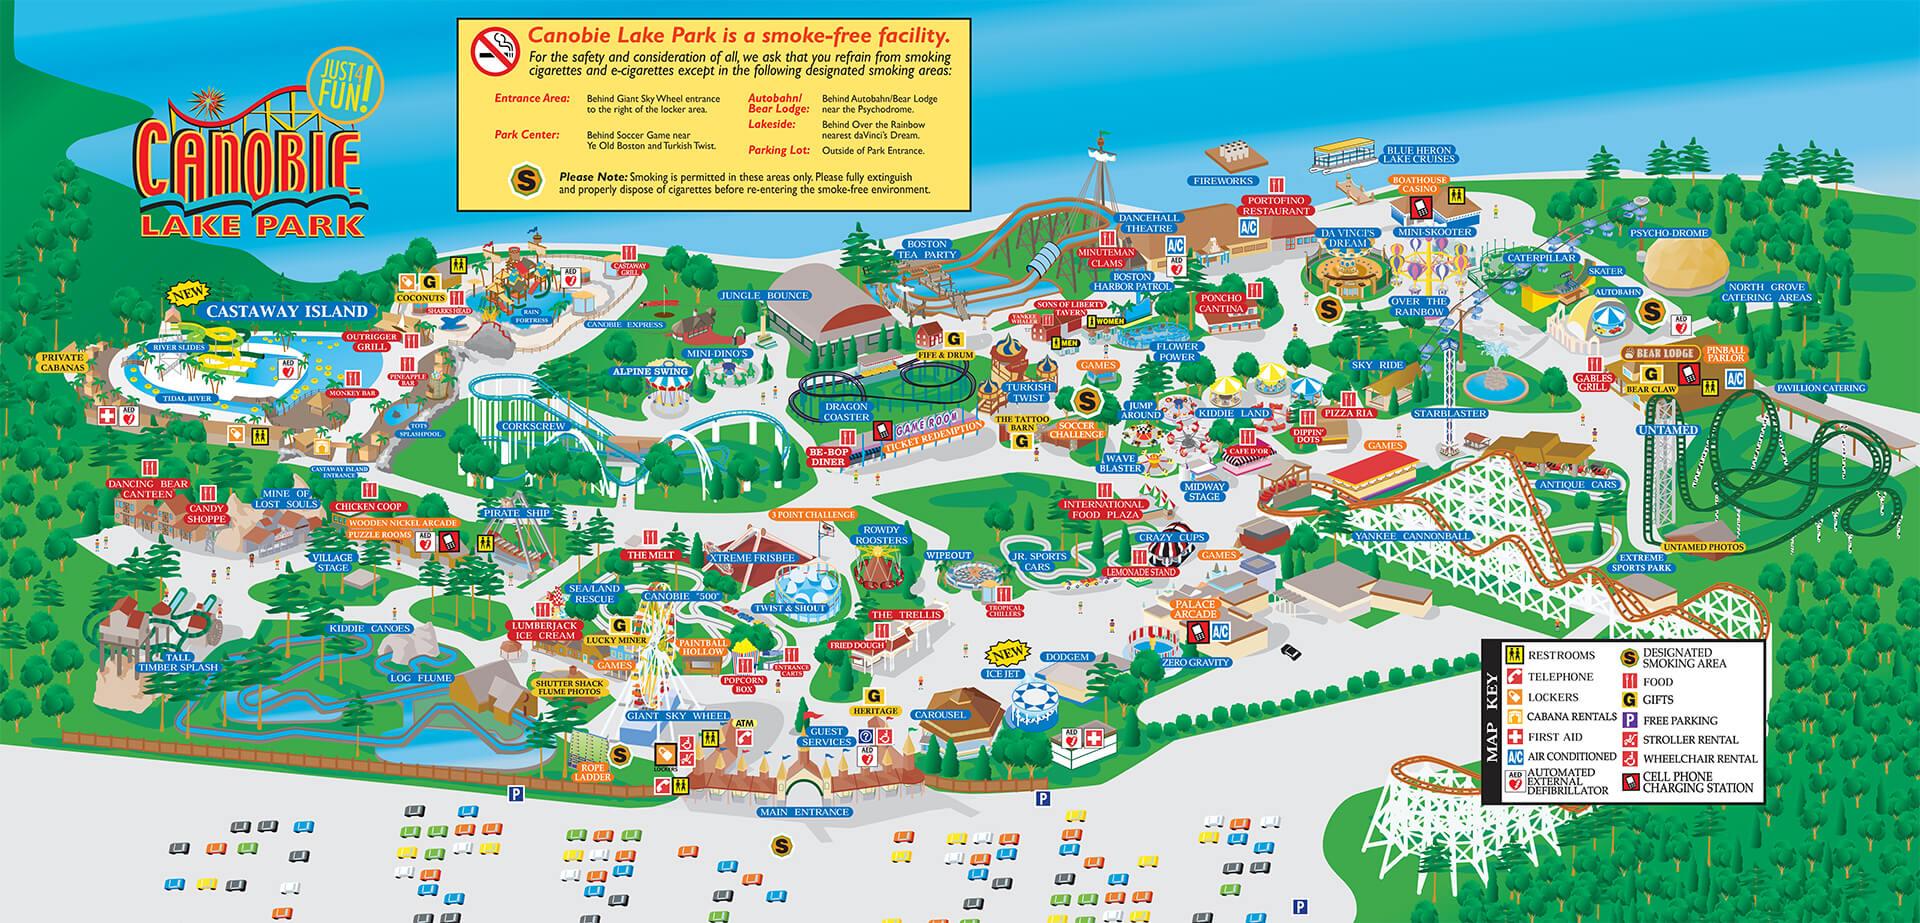 Park Map | Canobie Lake Park Designated Marketing Area Map on